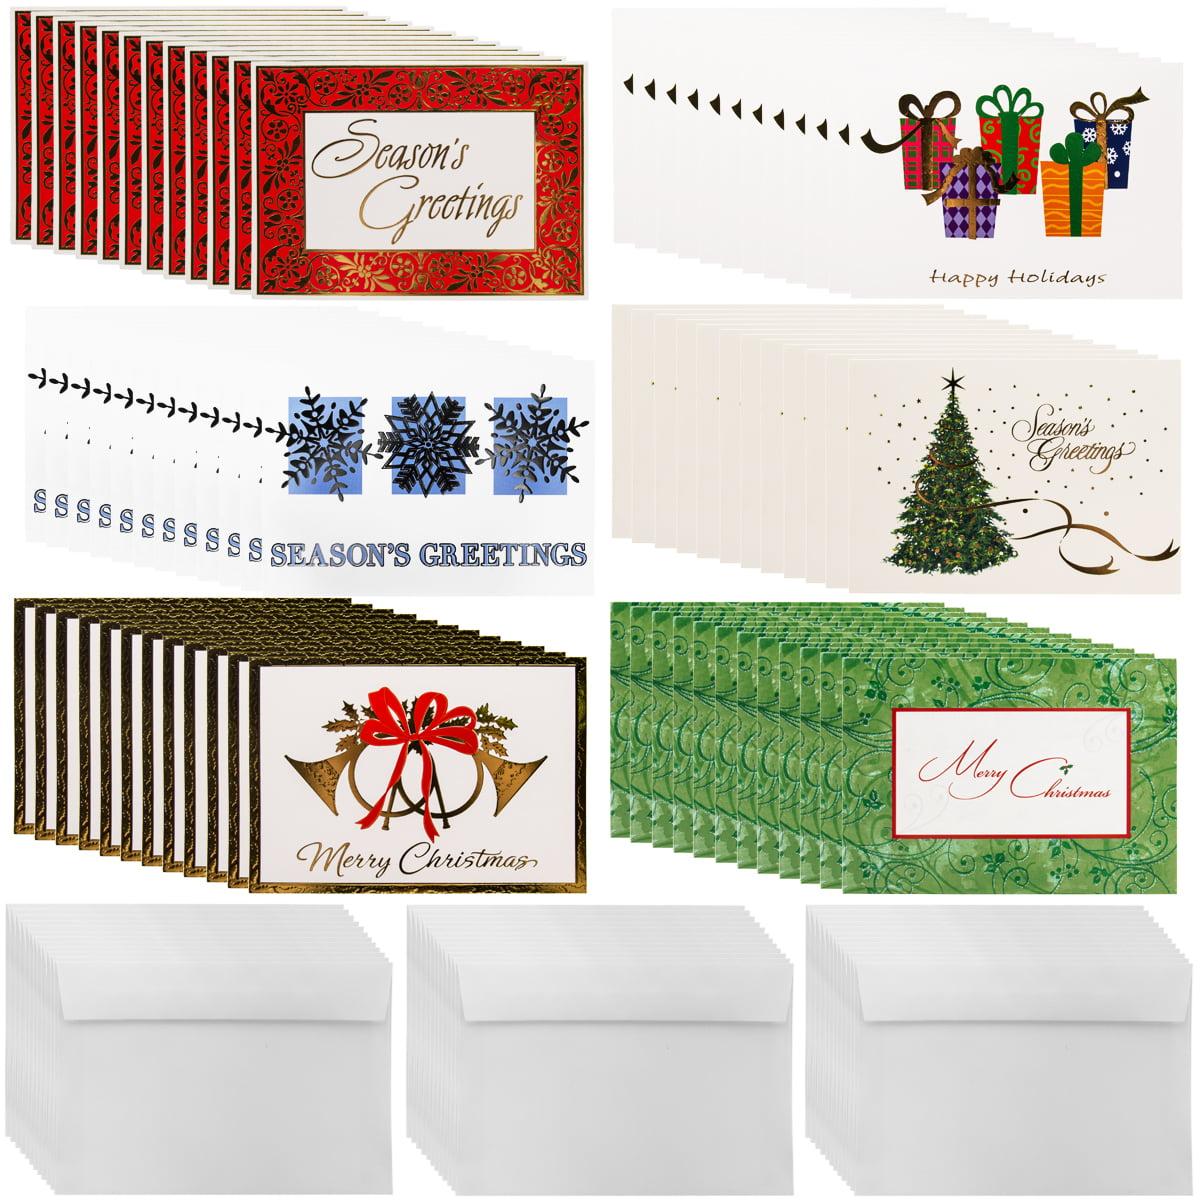 Designer Greetings (72ct) Holiday Cards & Envelopes Christmas Greetings Bulk Boxed Sets Glitter Foil